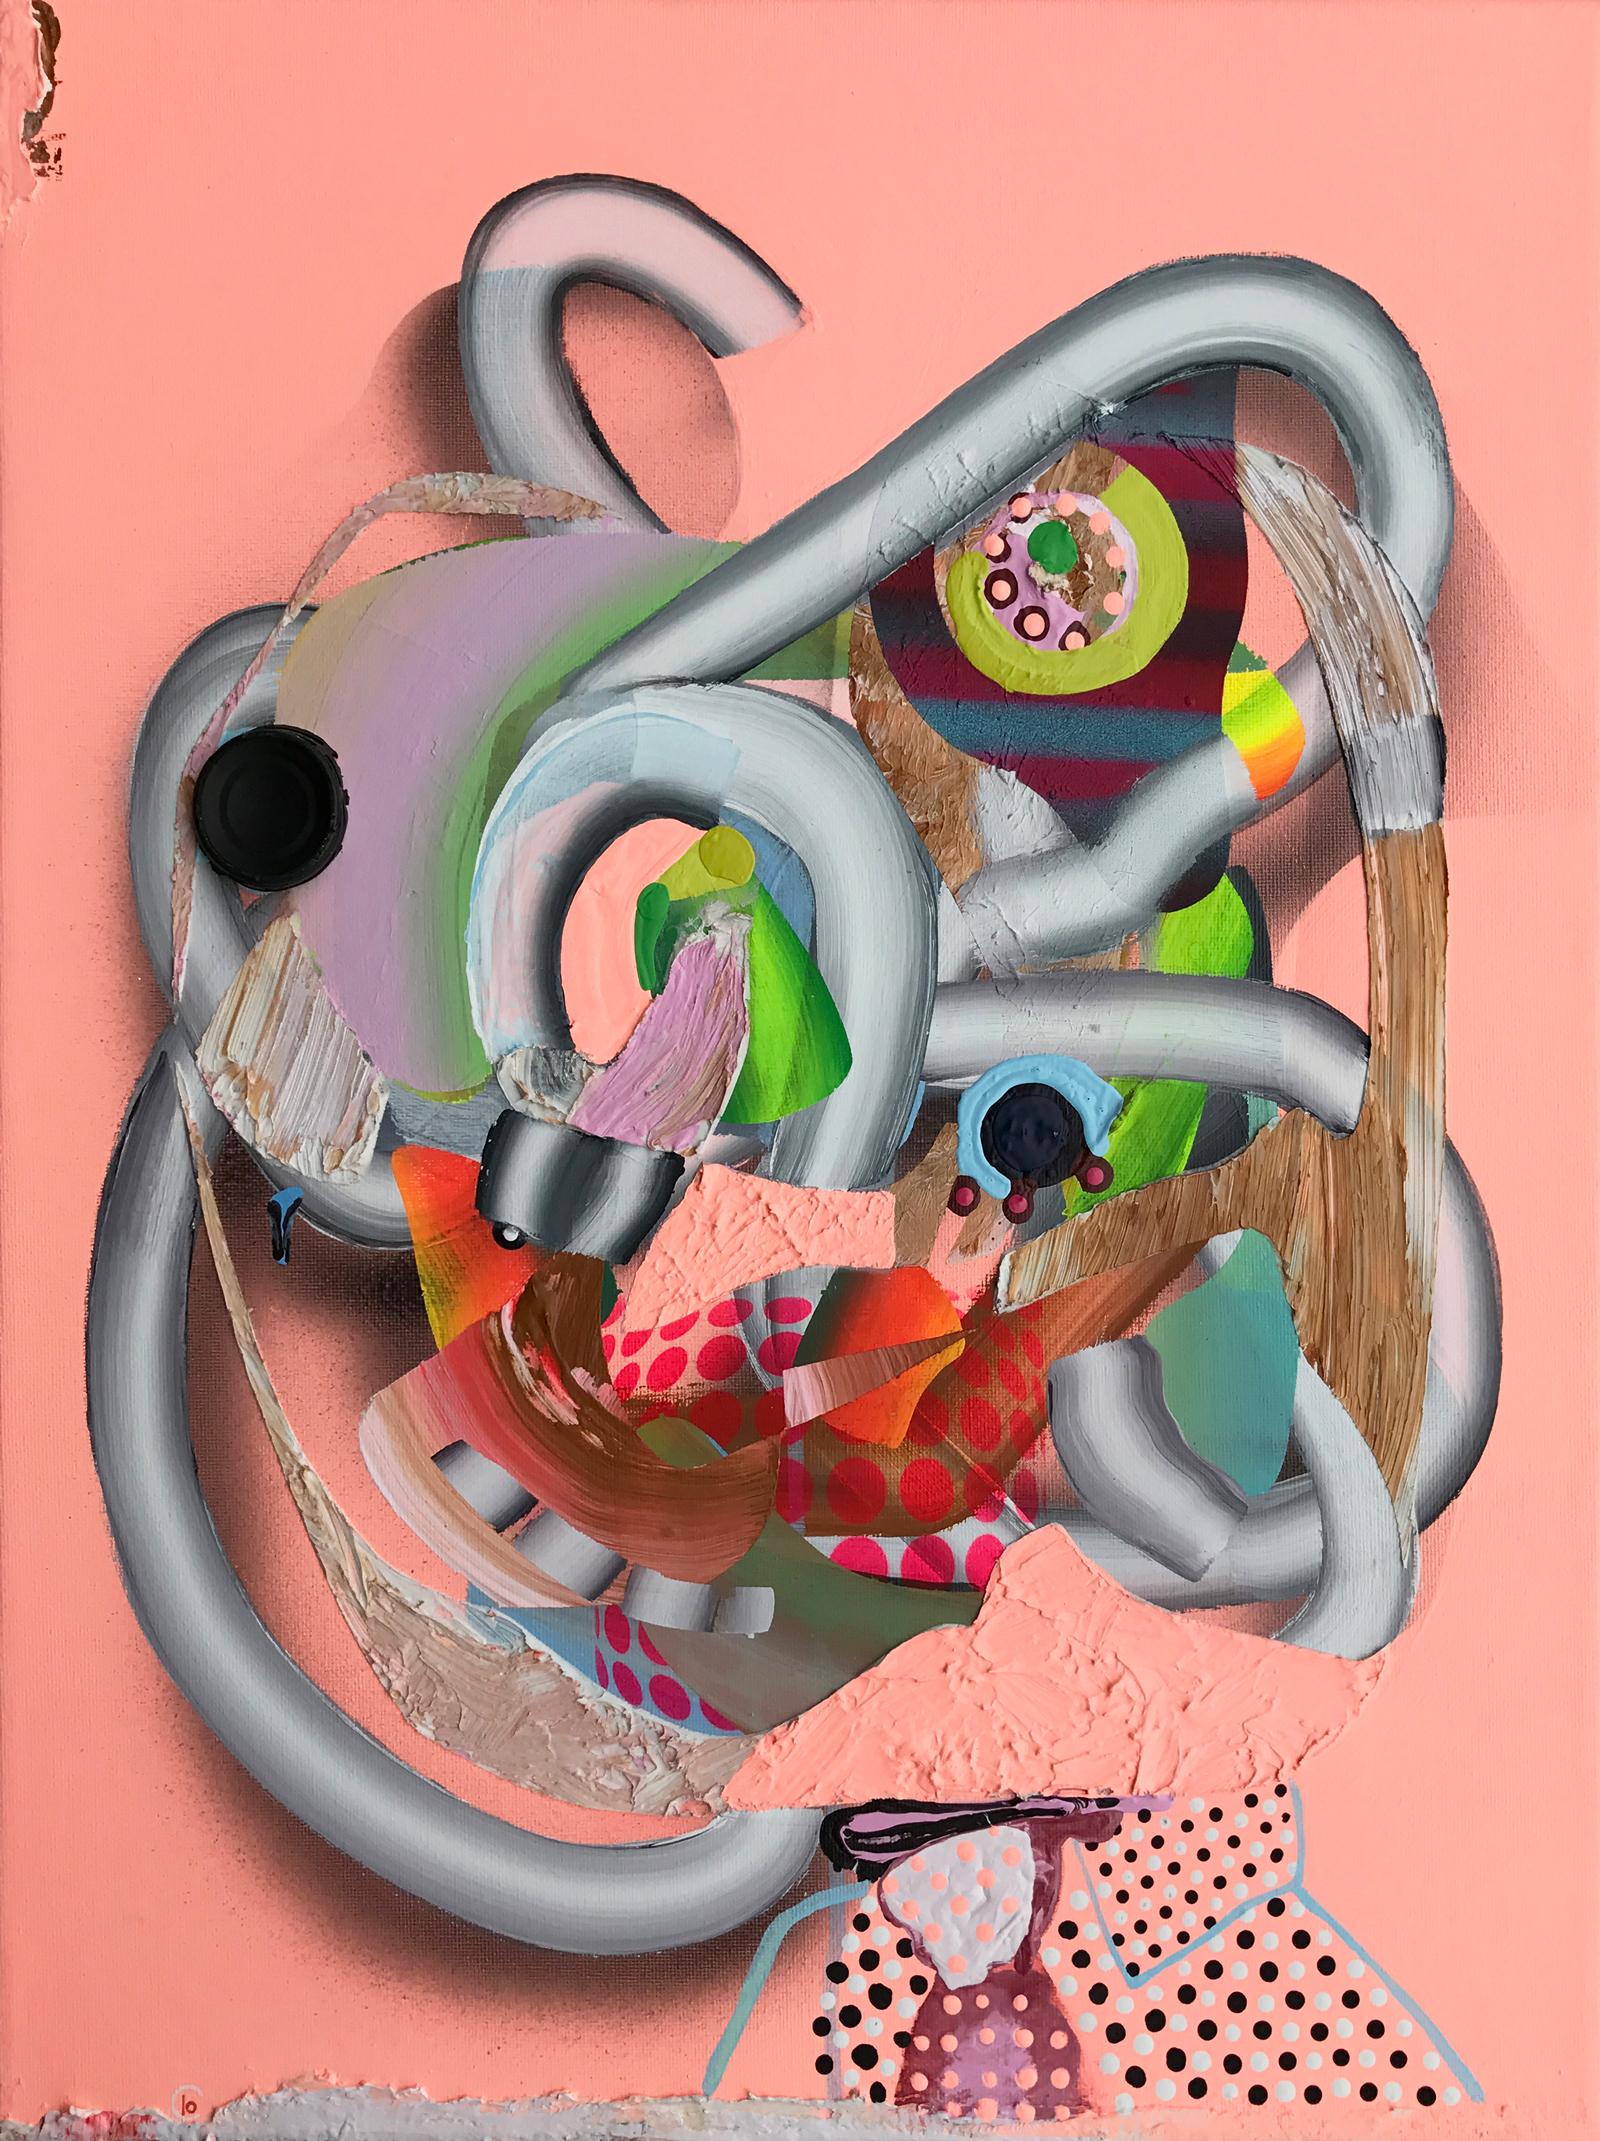 Acidic Taste, art exhibit @ Durden and Ray // photo source: Durden and Ray